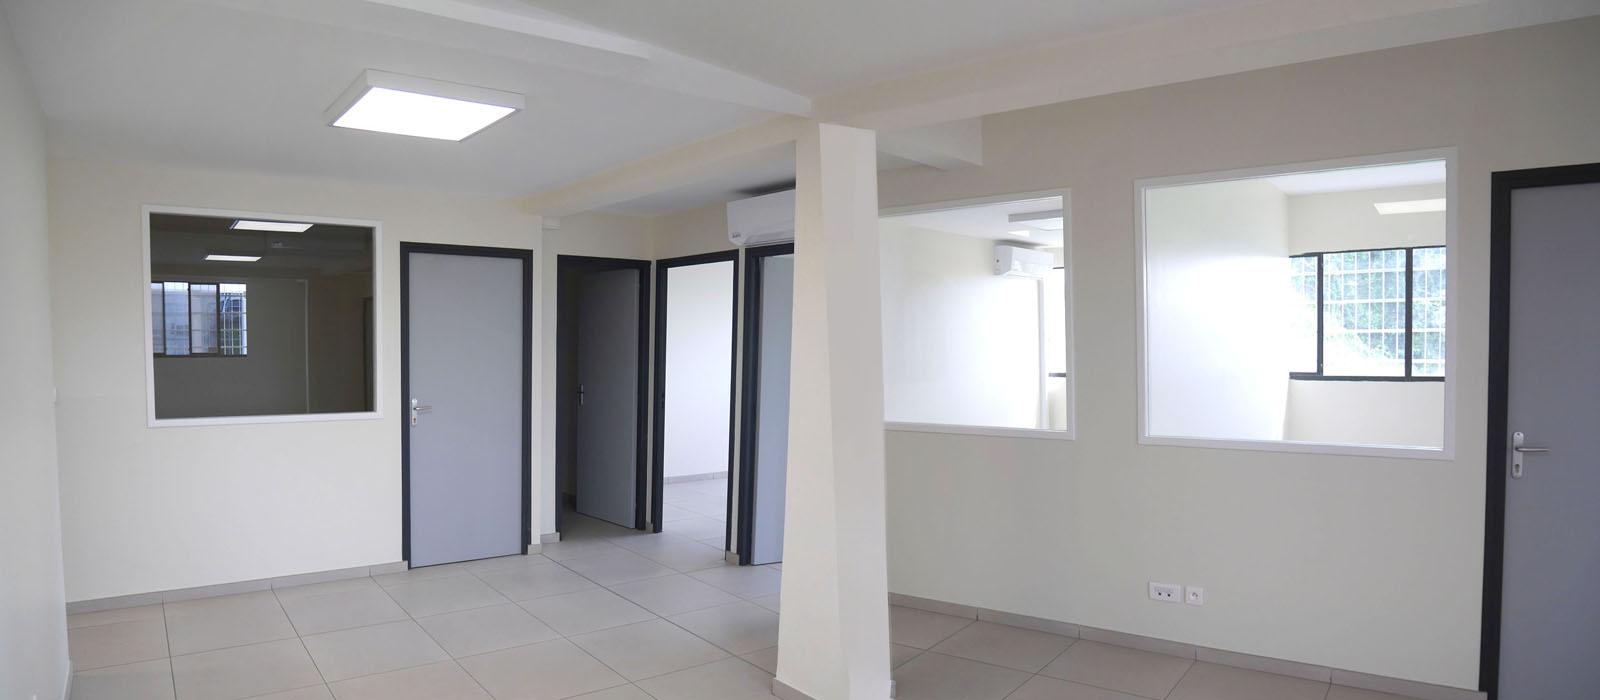 Helene-Quillet-renovation-bureaux-martinique-972-realisation-01.jpg